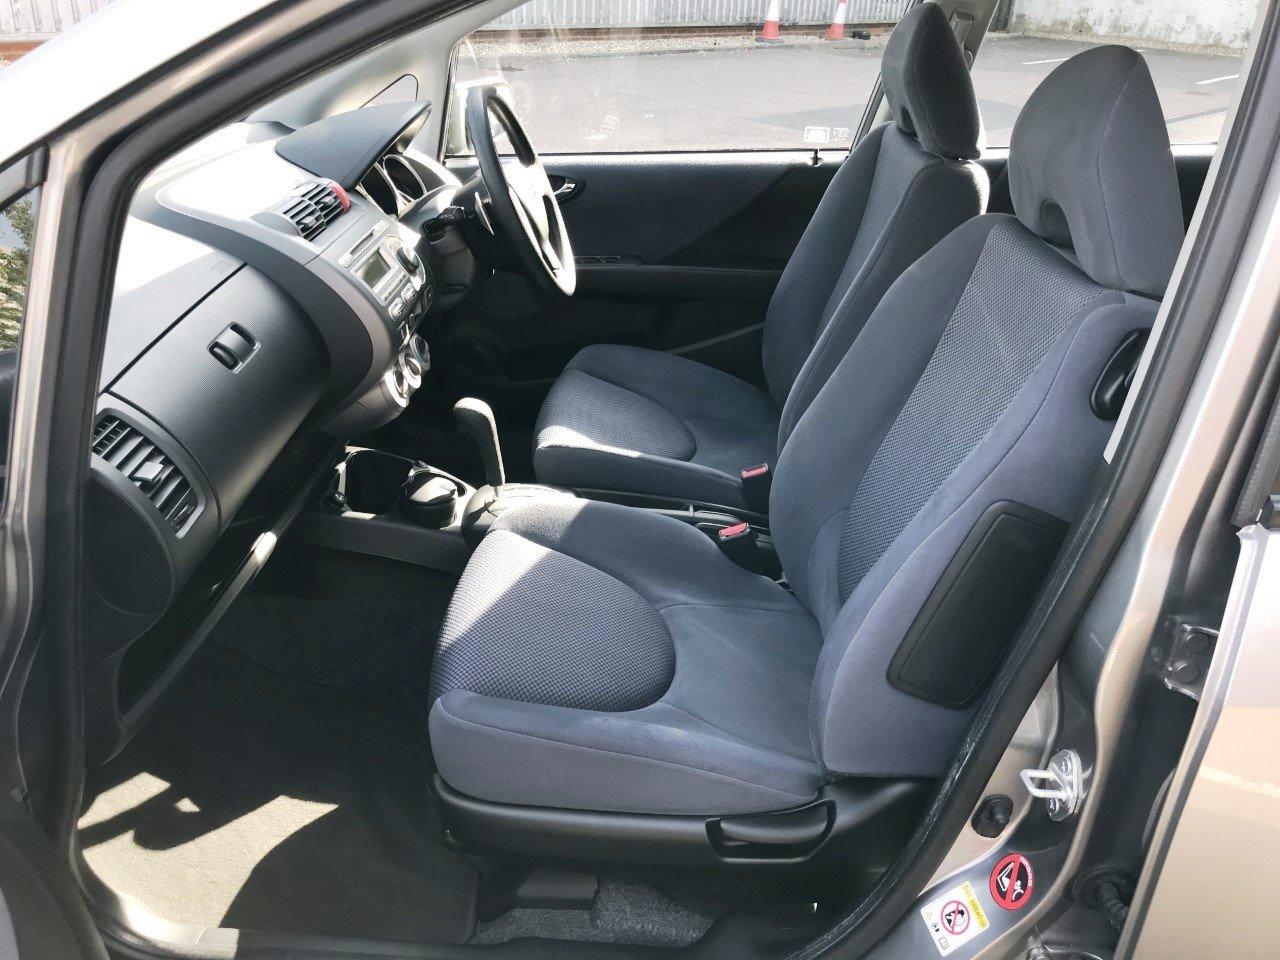 2006 Honda Jazz 1.4 i-DSI SE AUTO 5dr LOW/MILS/38k For Sale (picture 5 of 6)